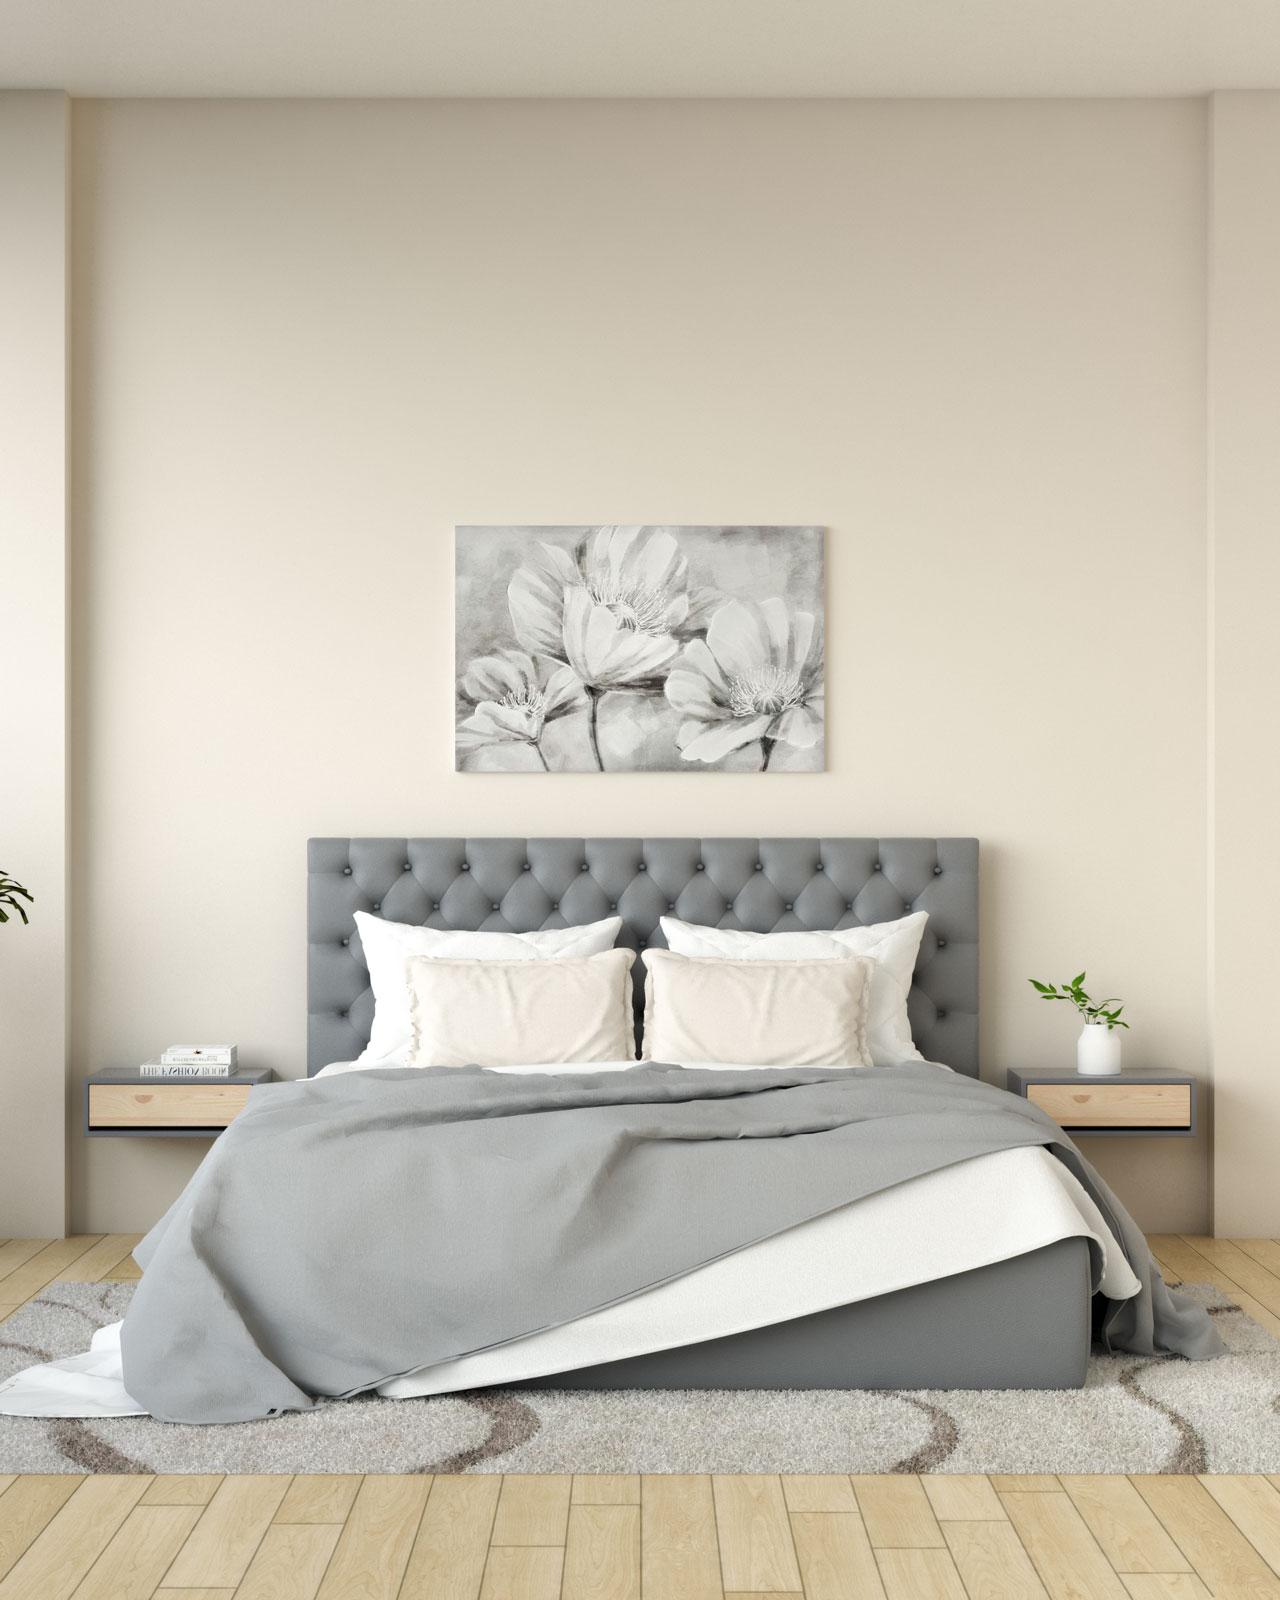 Beige wall with gray headboard